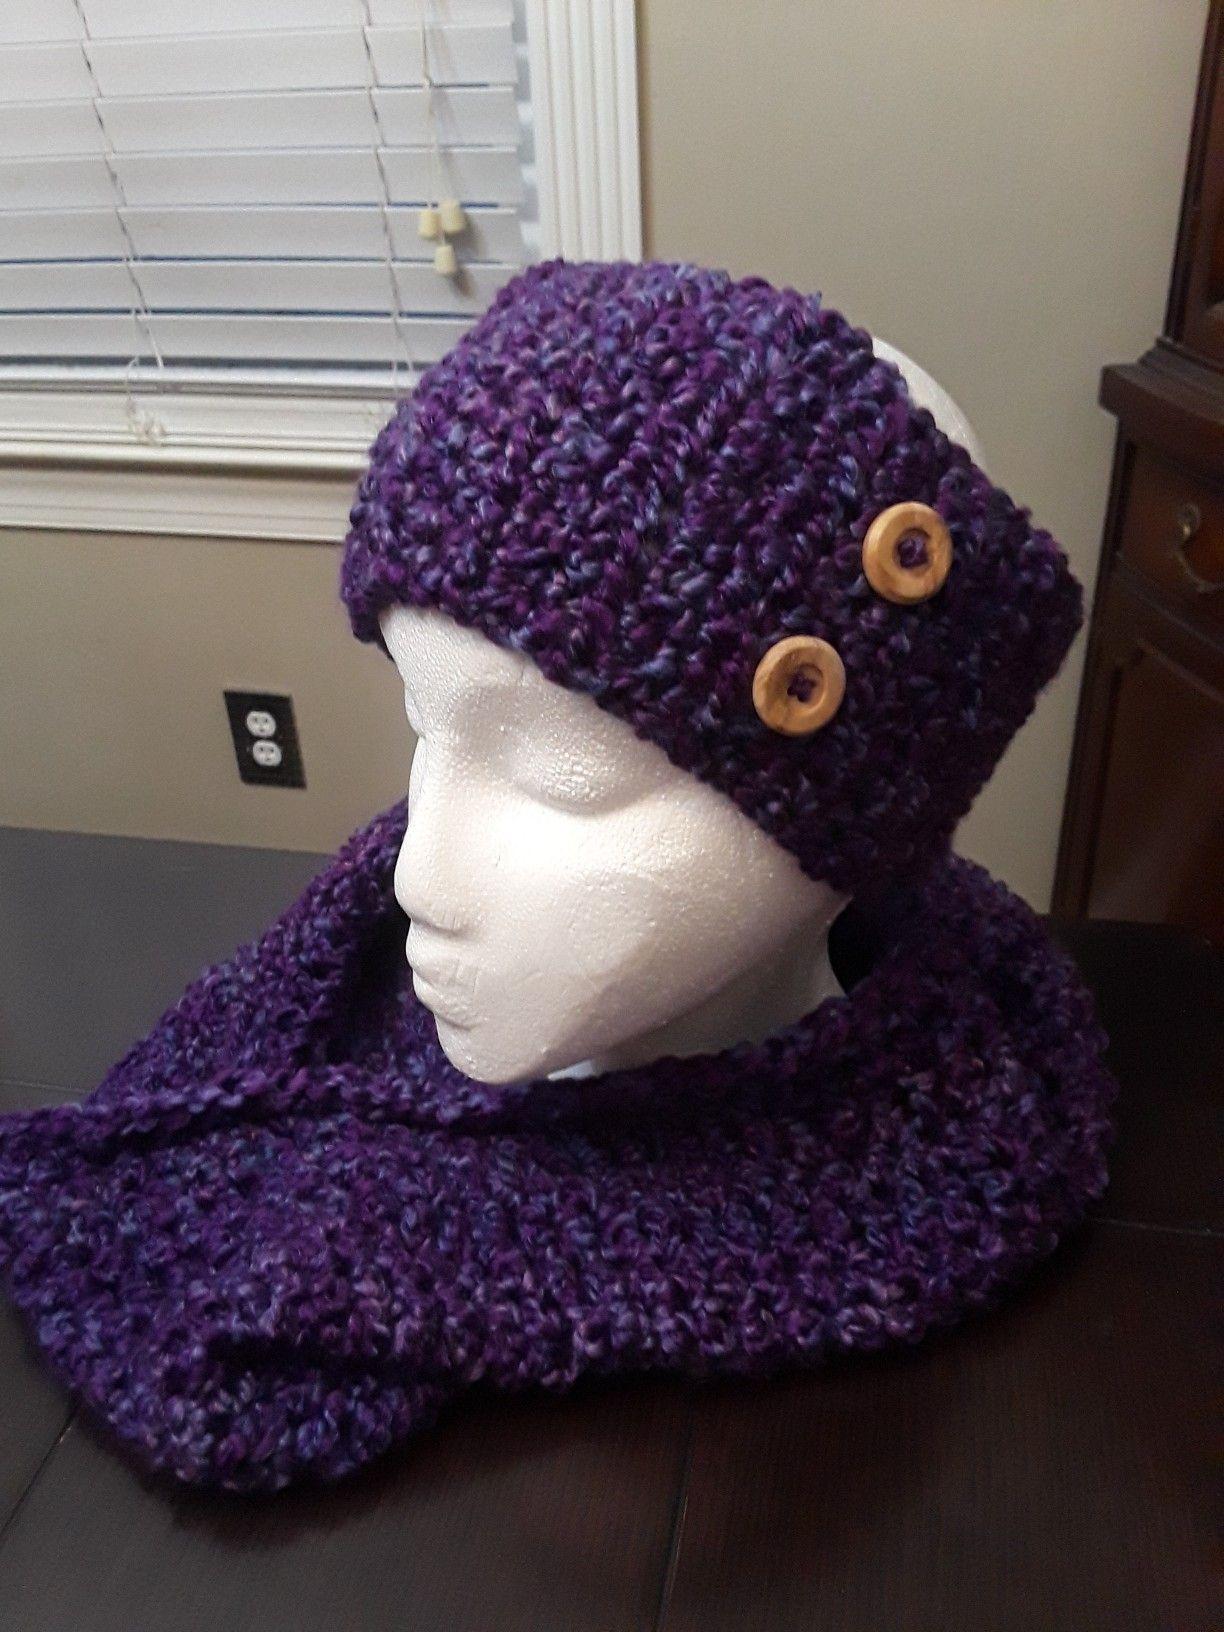 93930af278e8a9 Crochet Hats, Beanie, Fashion, Knitting Hats, Moda, Crocheted Hats, Brim